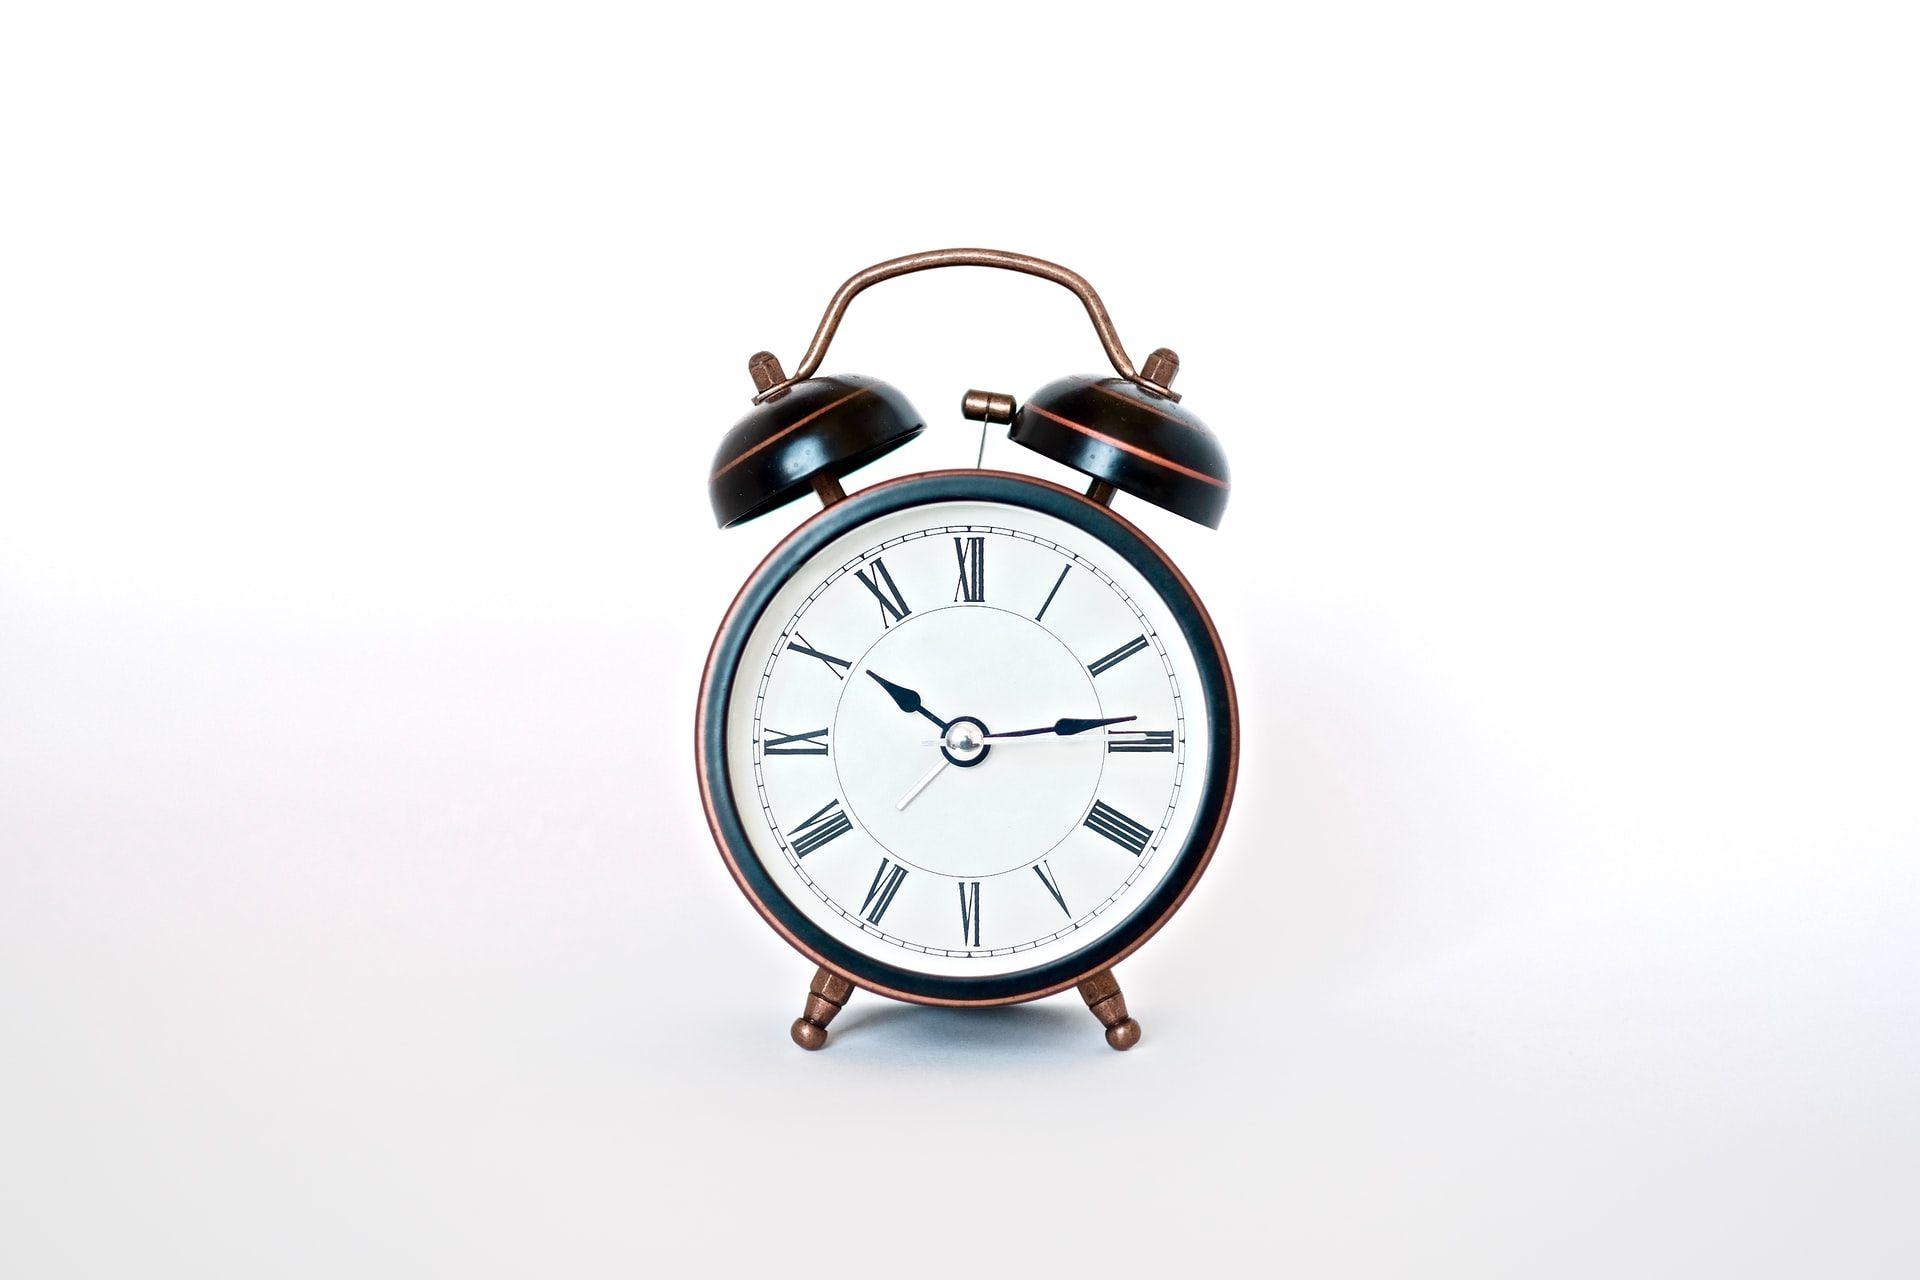 Timezone Challenge (Credit: Unsplash)